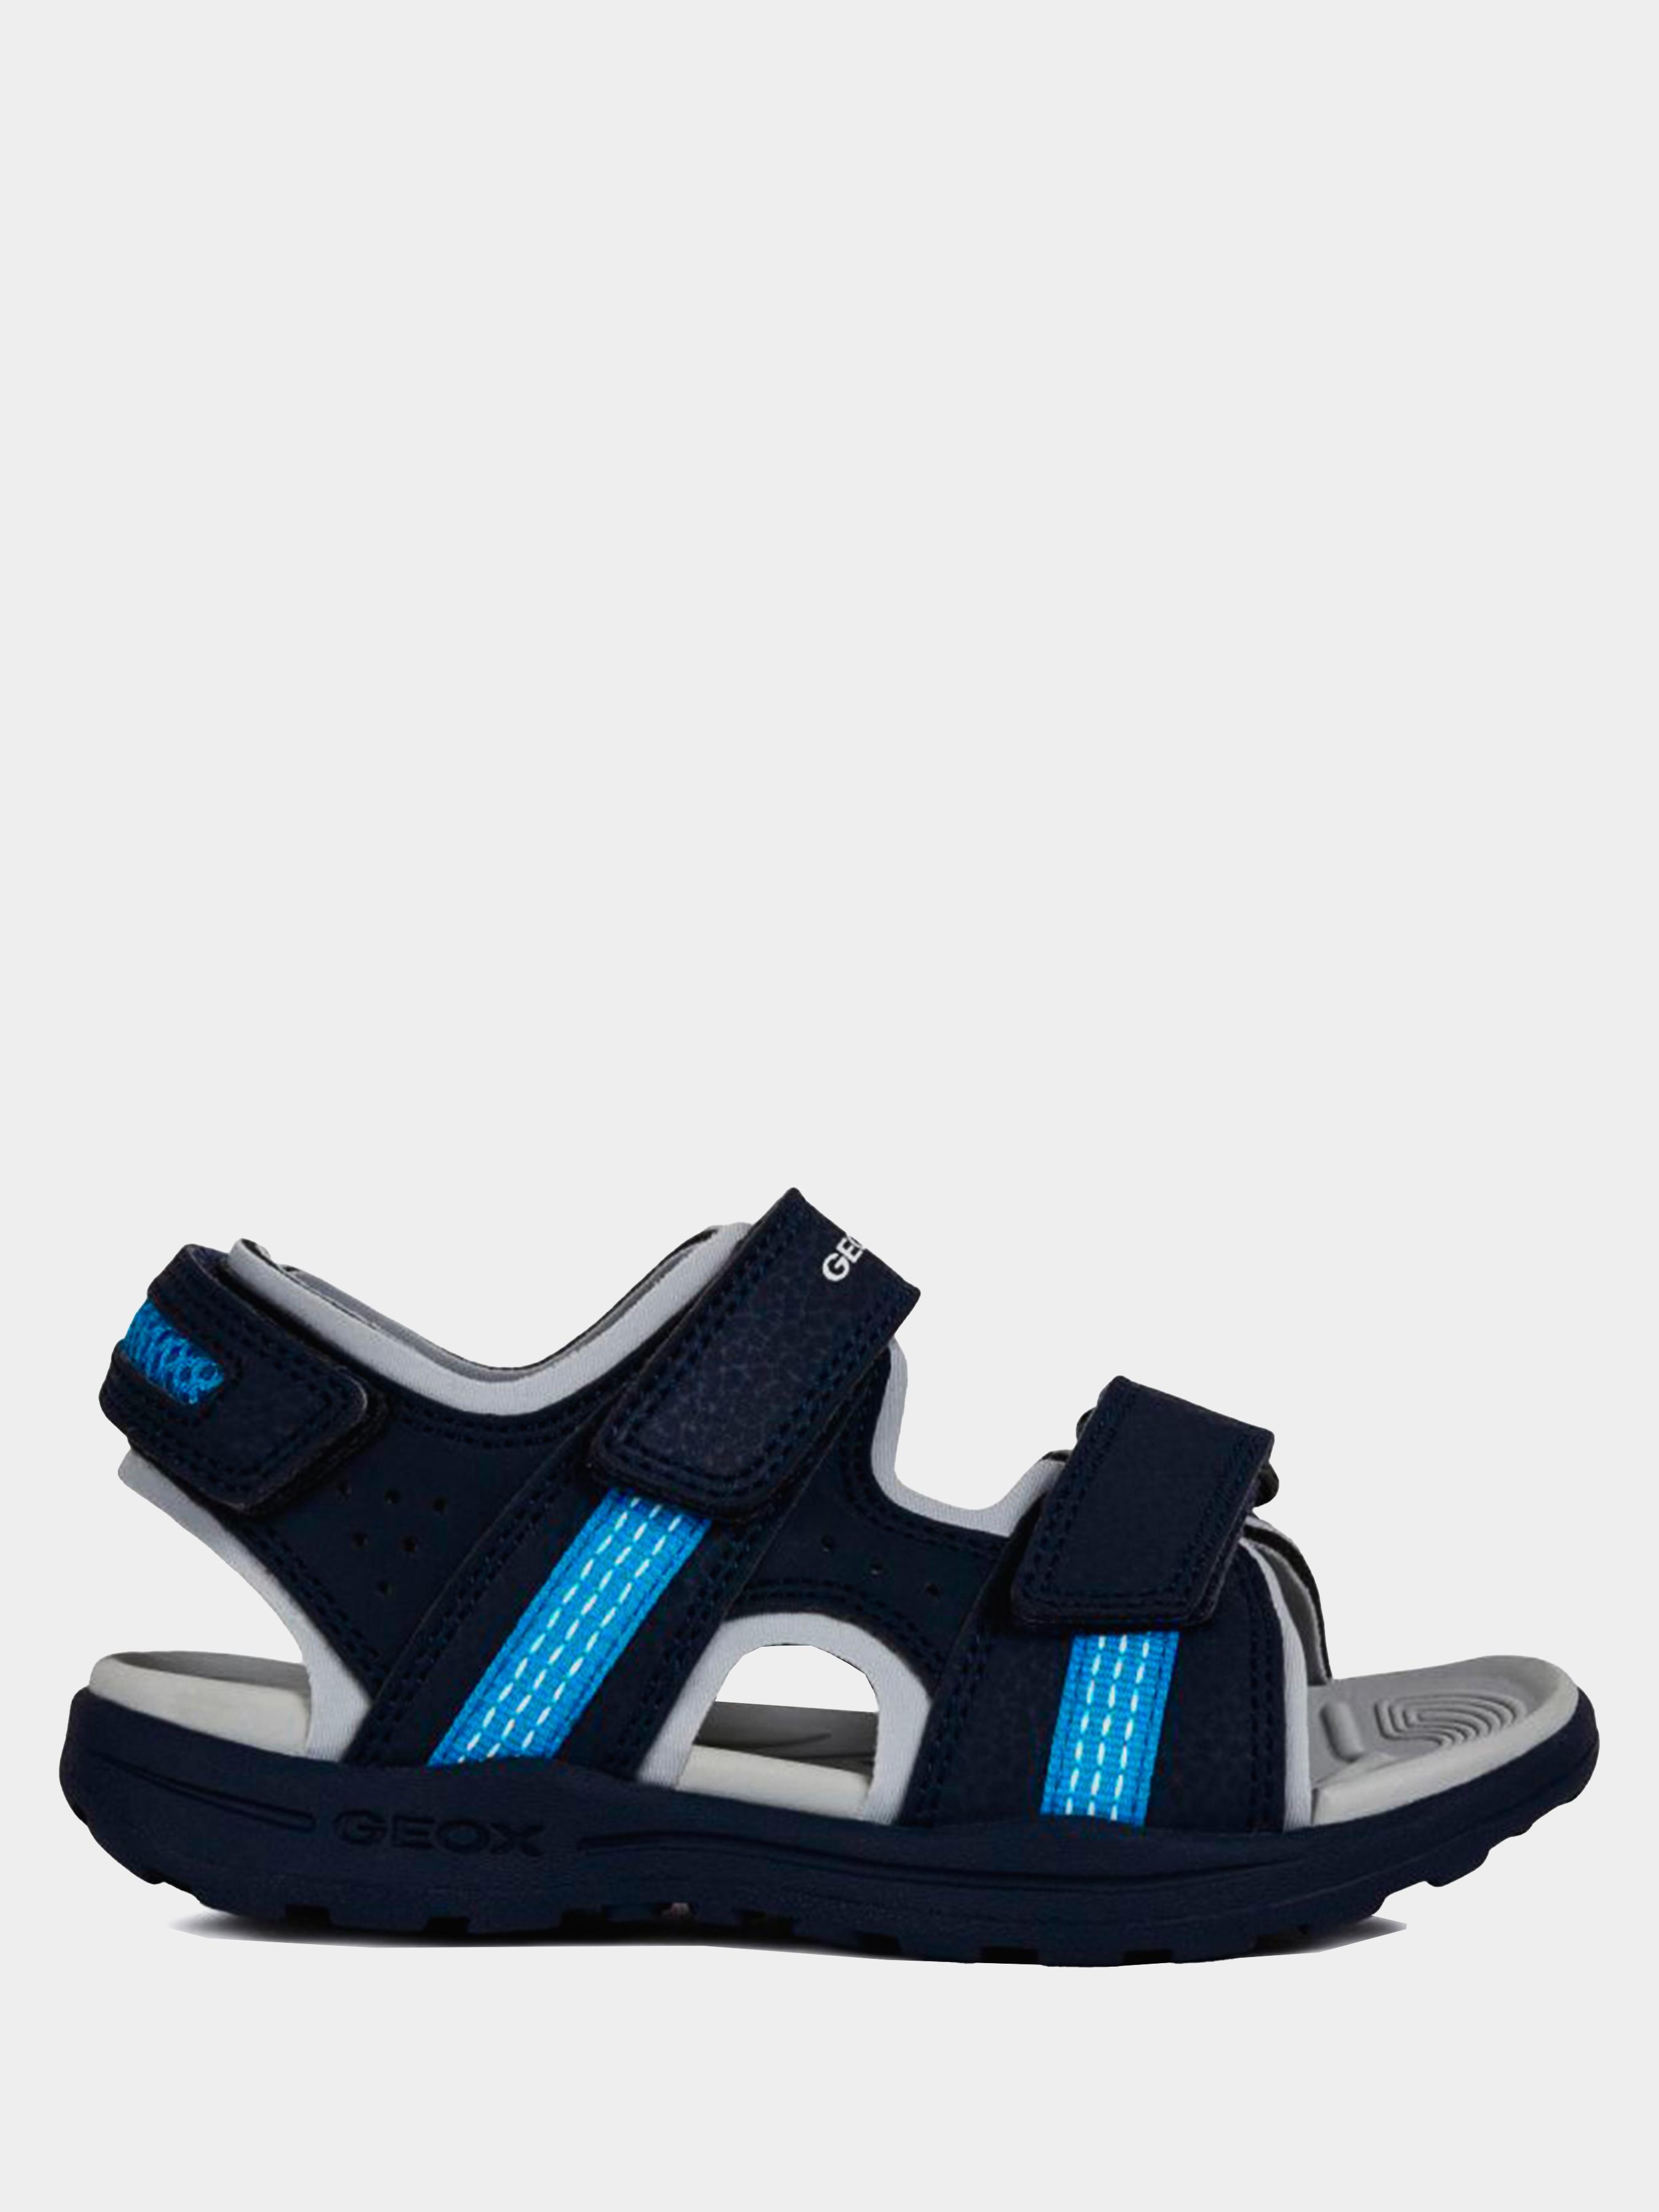 Сандалии детские Geox J VANIETT BOY XK6127 размеры обуви, 2017